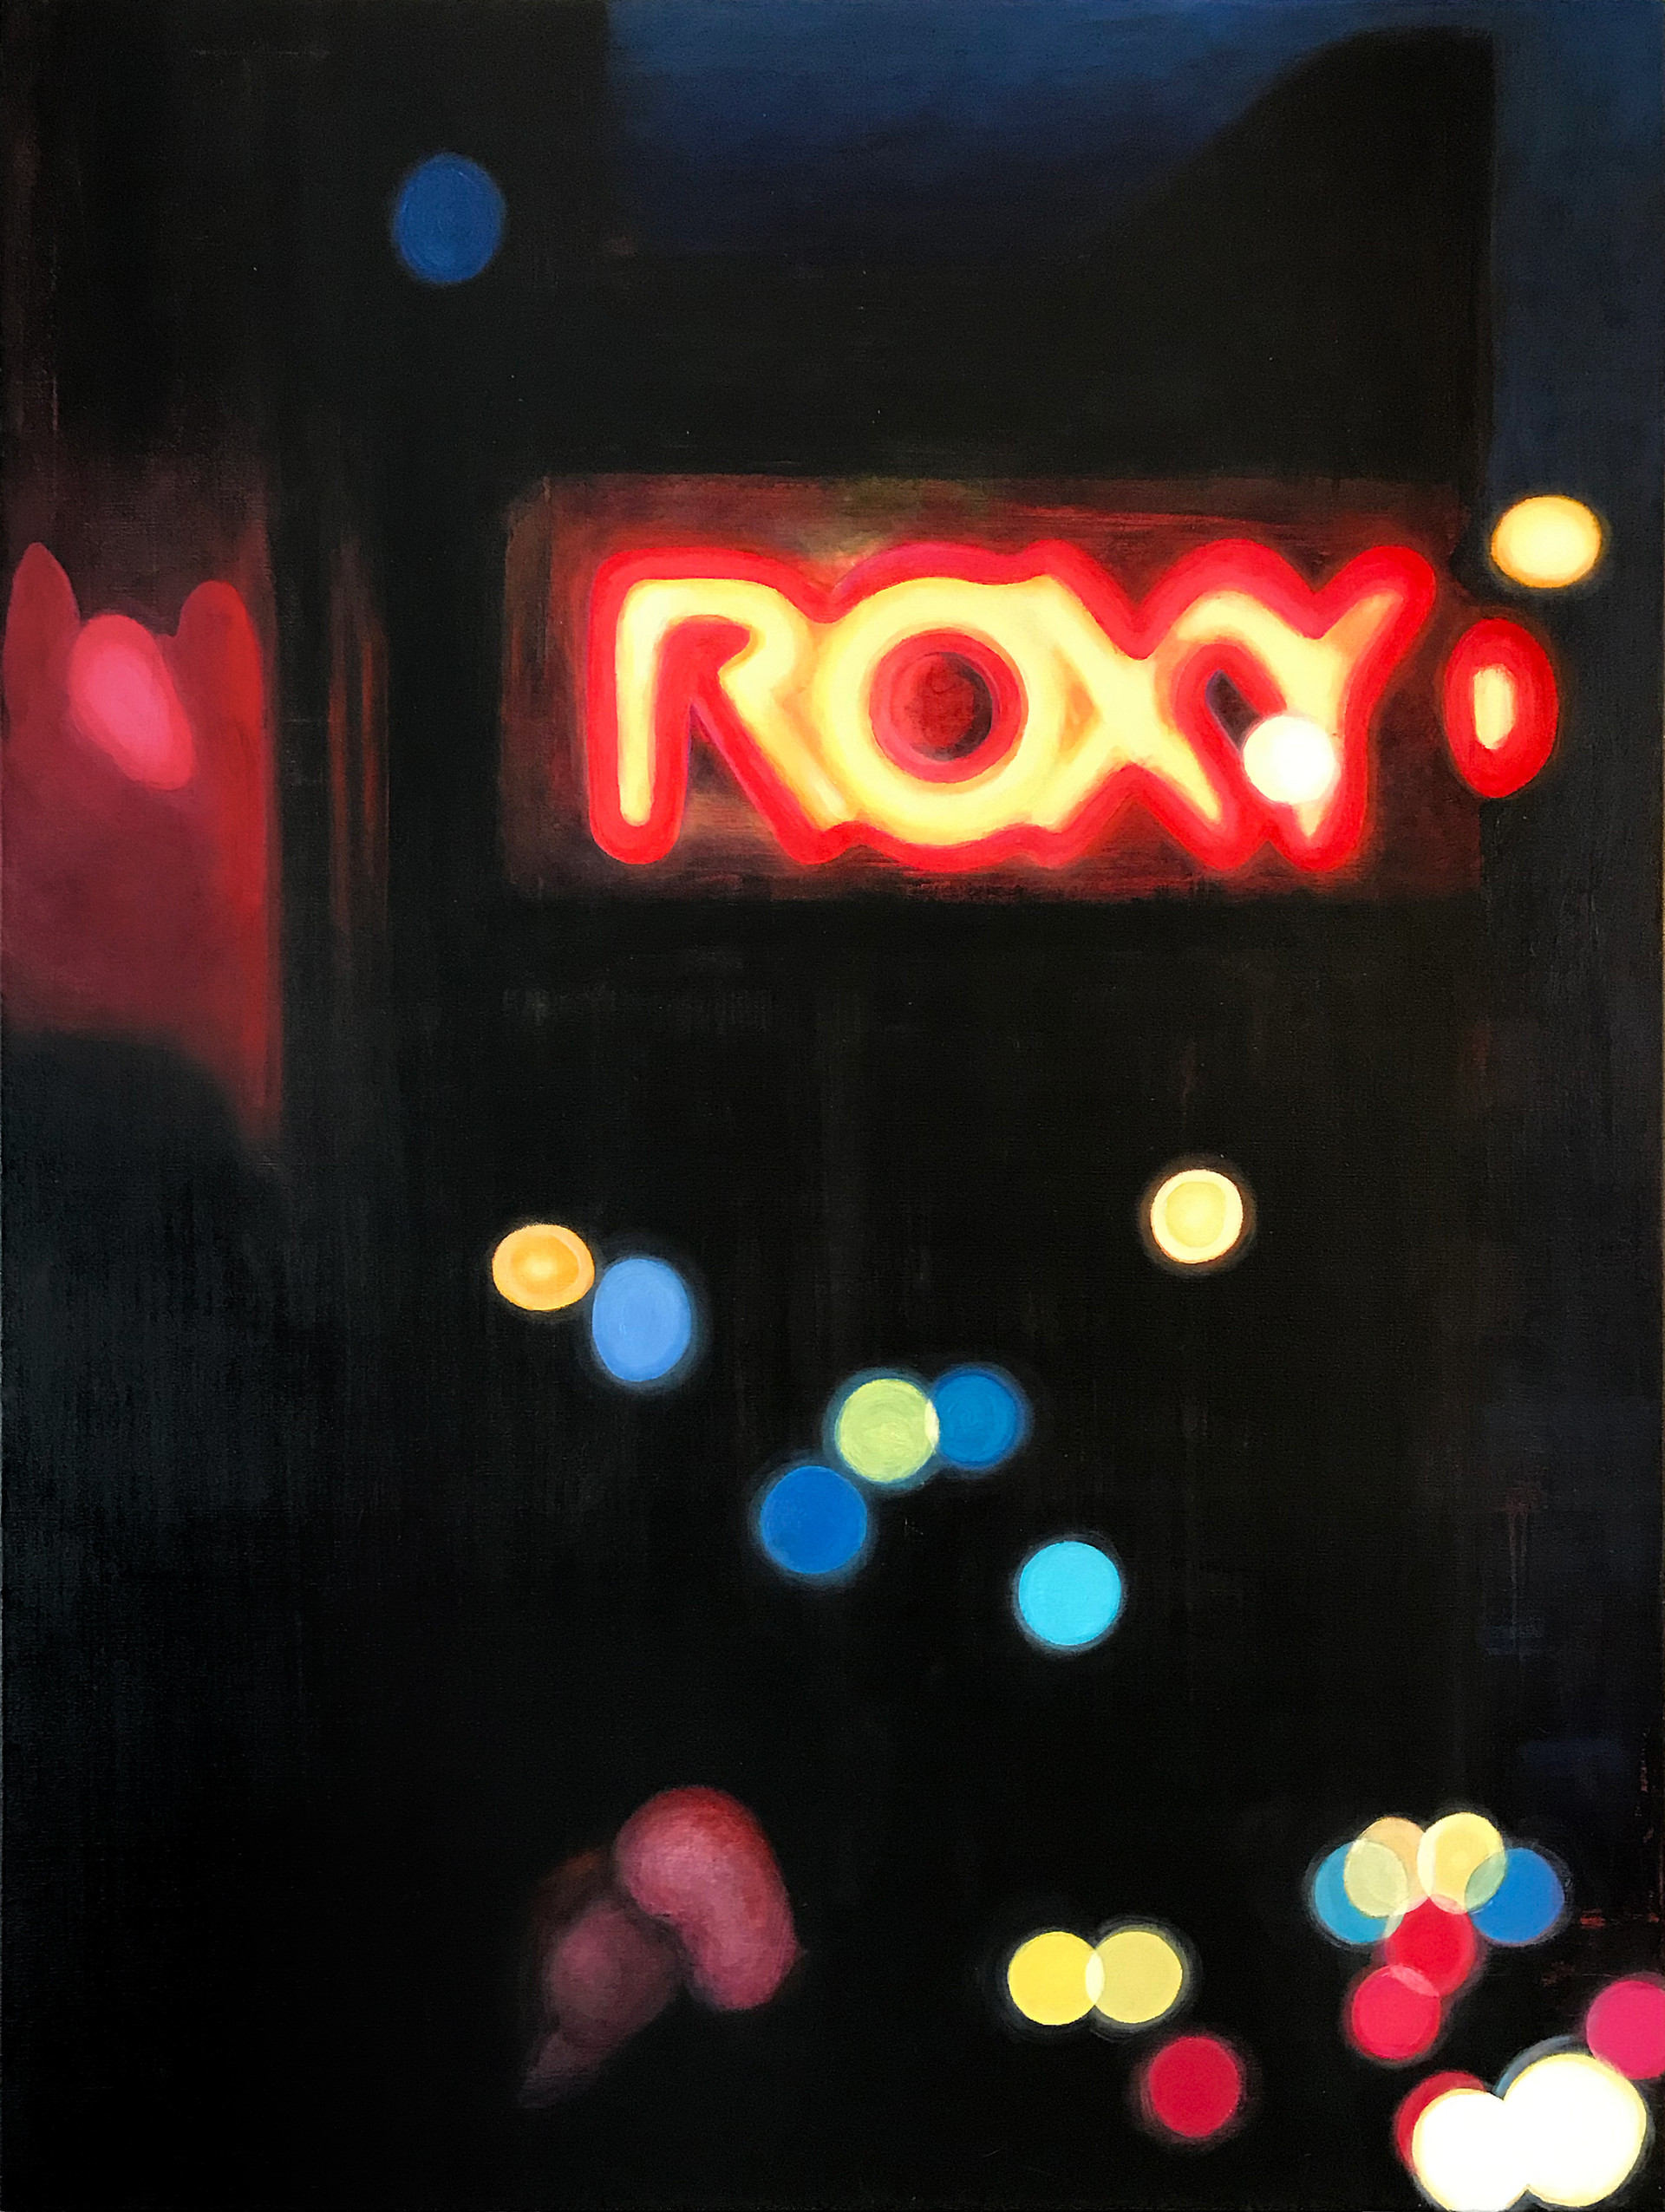 NOCTURNE #15 / Roxy